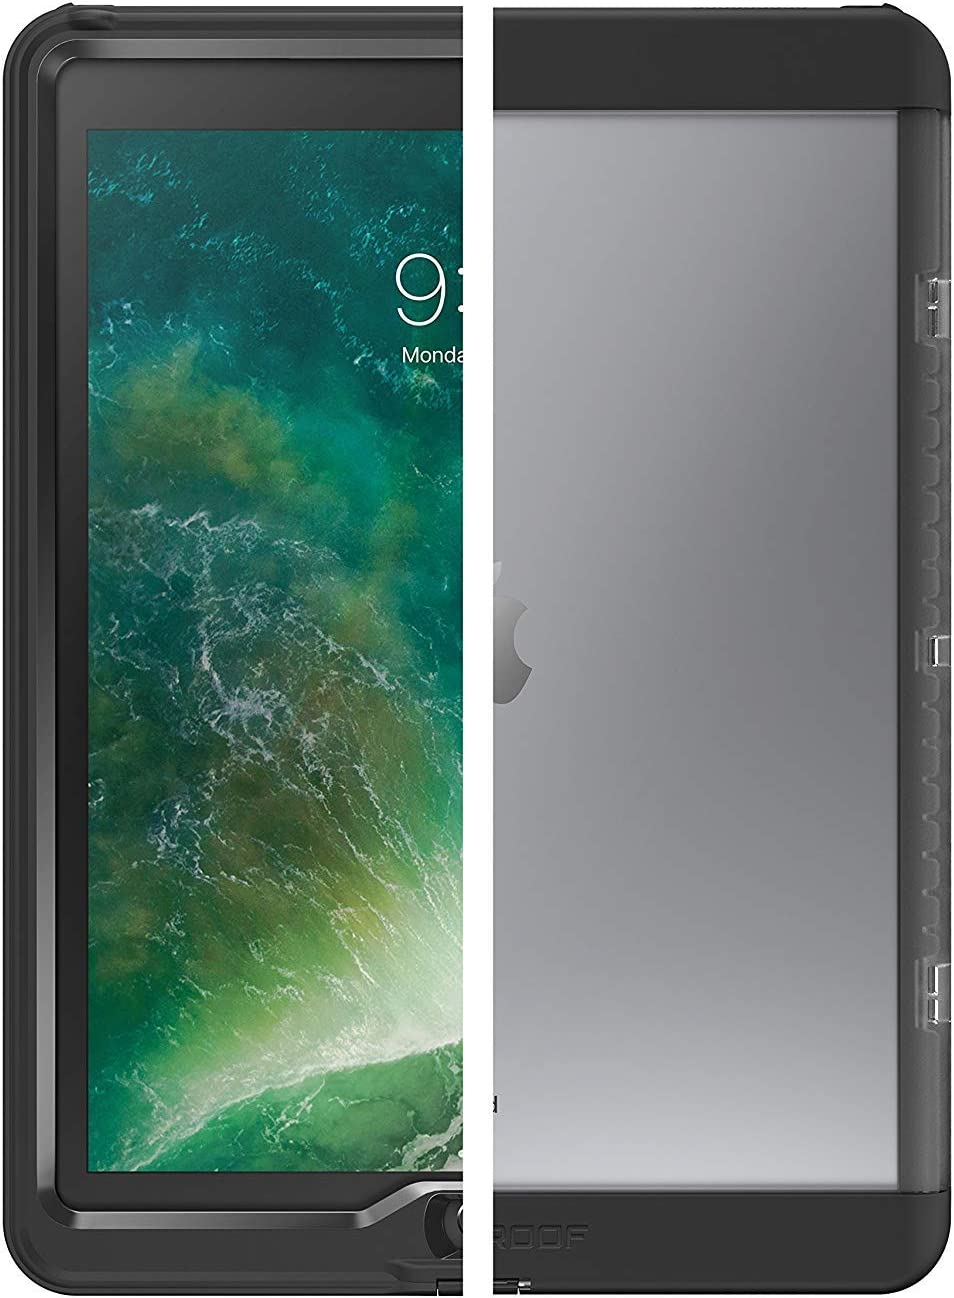 LifeProof NÜÜD Series Waterproof Case for iPad Pro (12.9